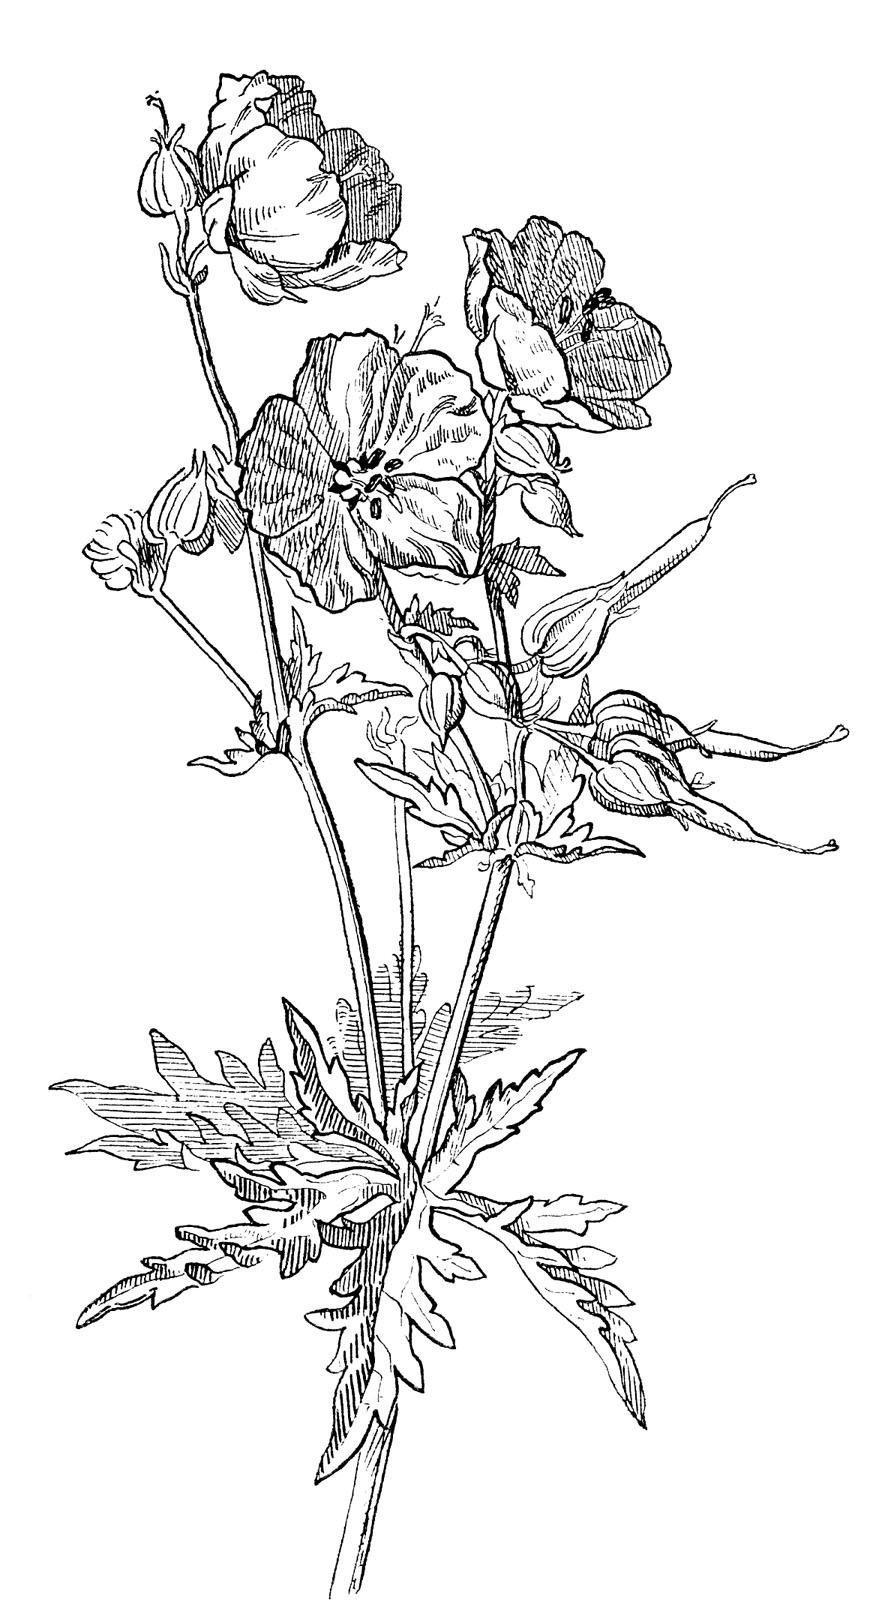 Drawn vintage flower line drawn Options Geranium 4 Beautiful Drawing